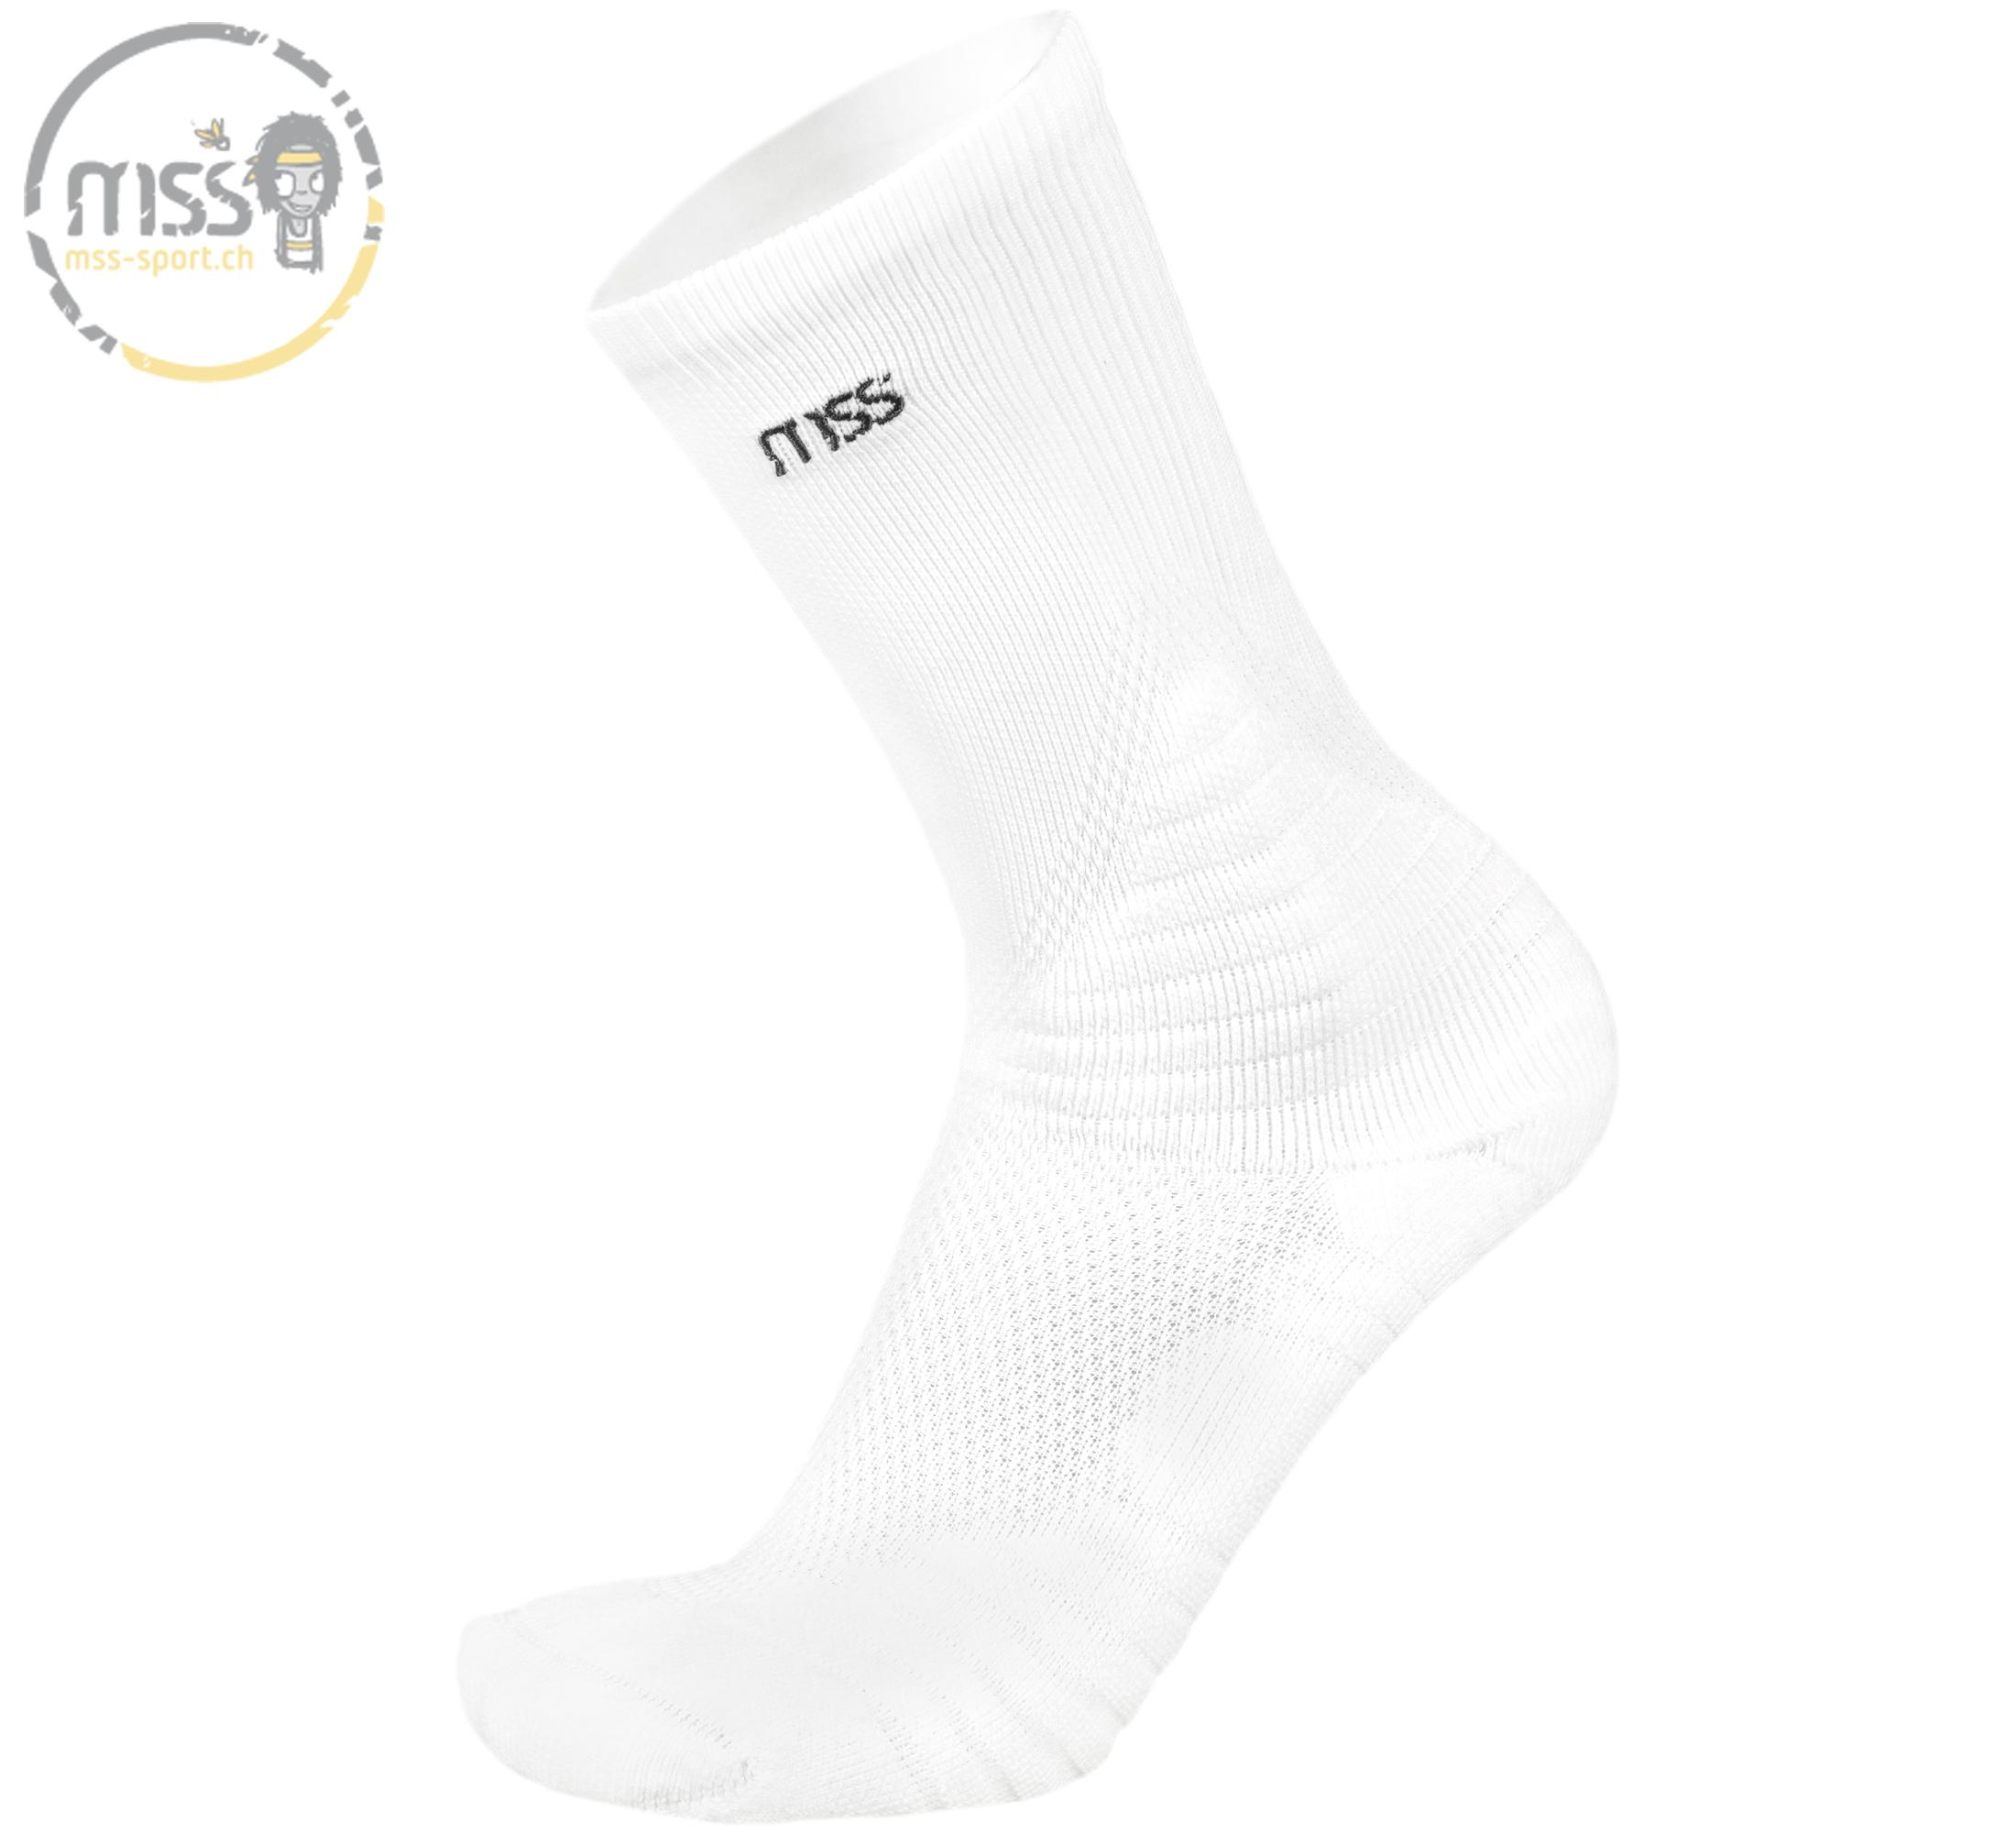 mss-socks Smash 5700 high white